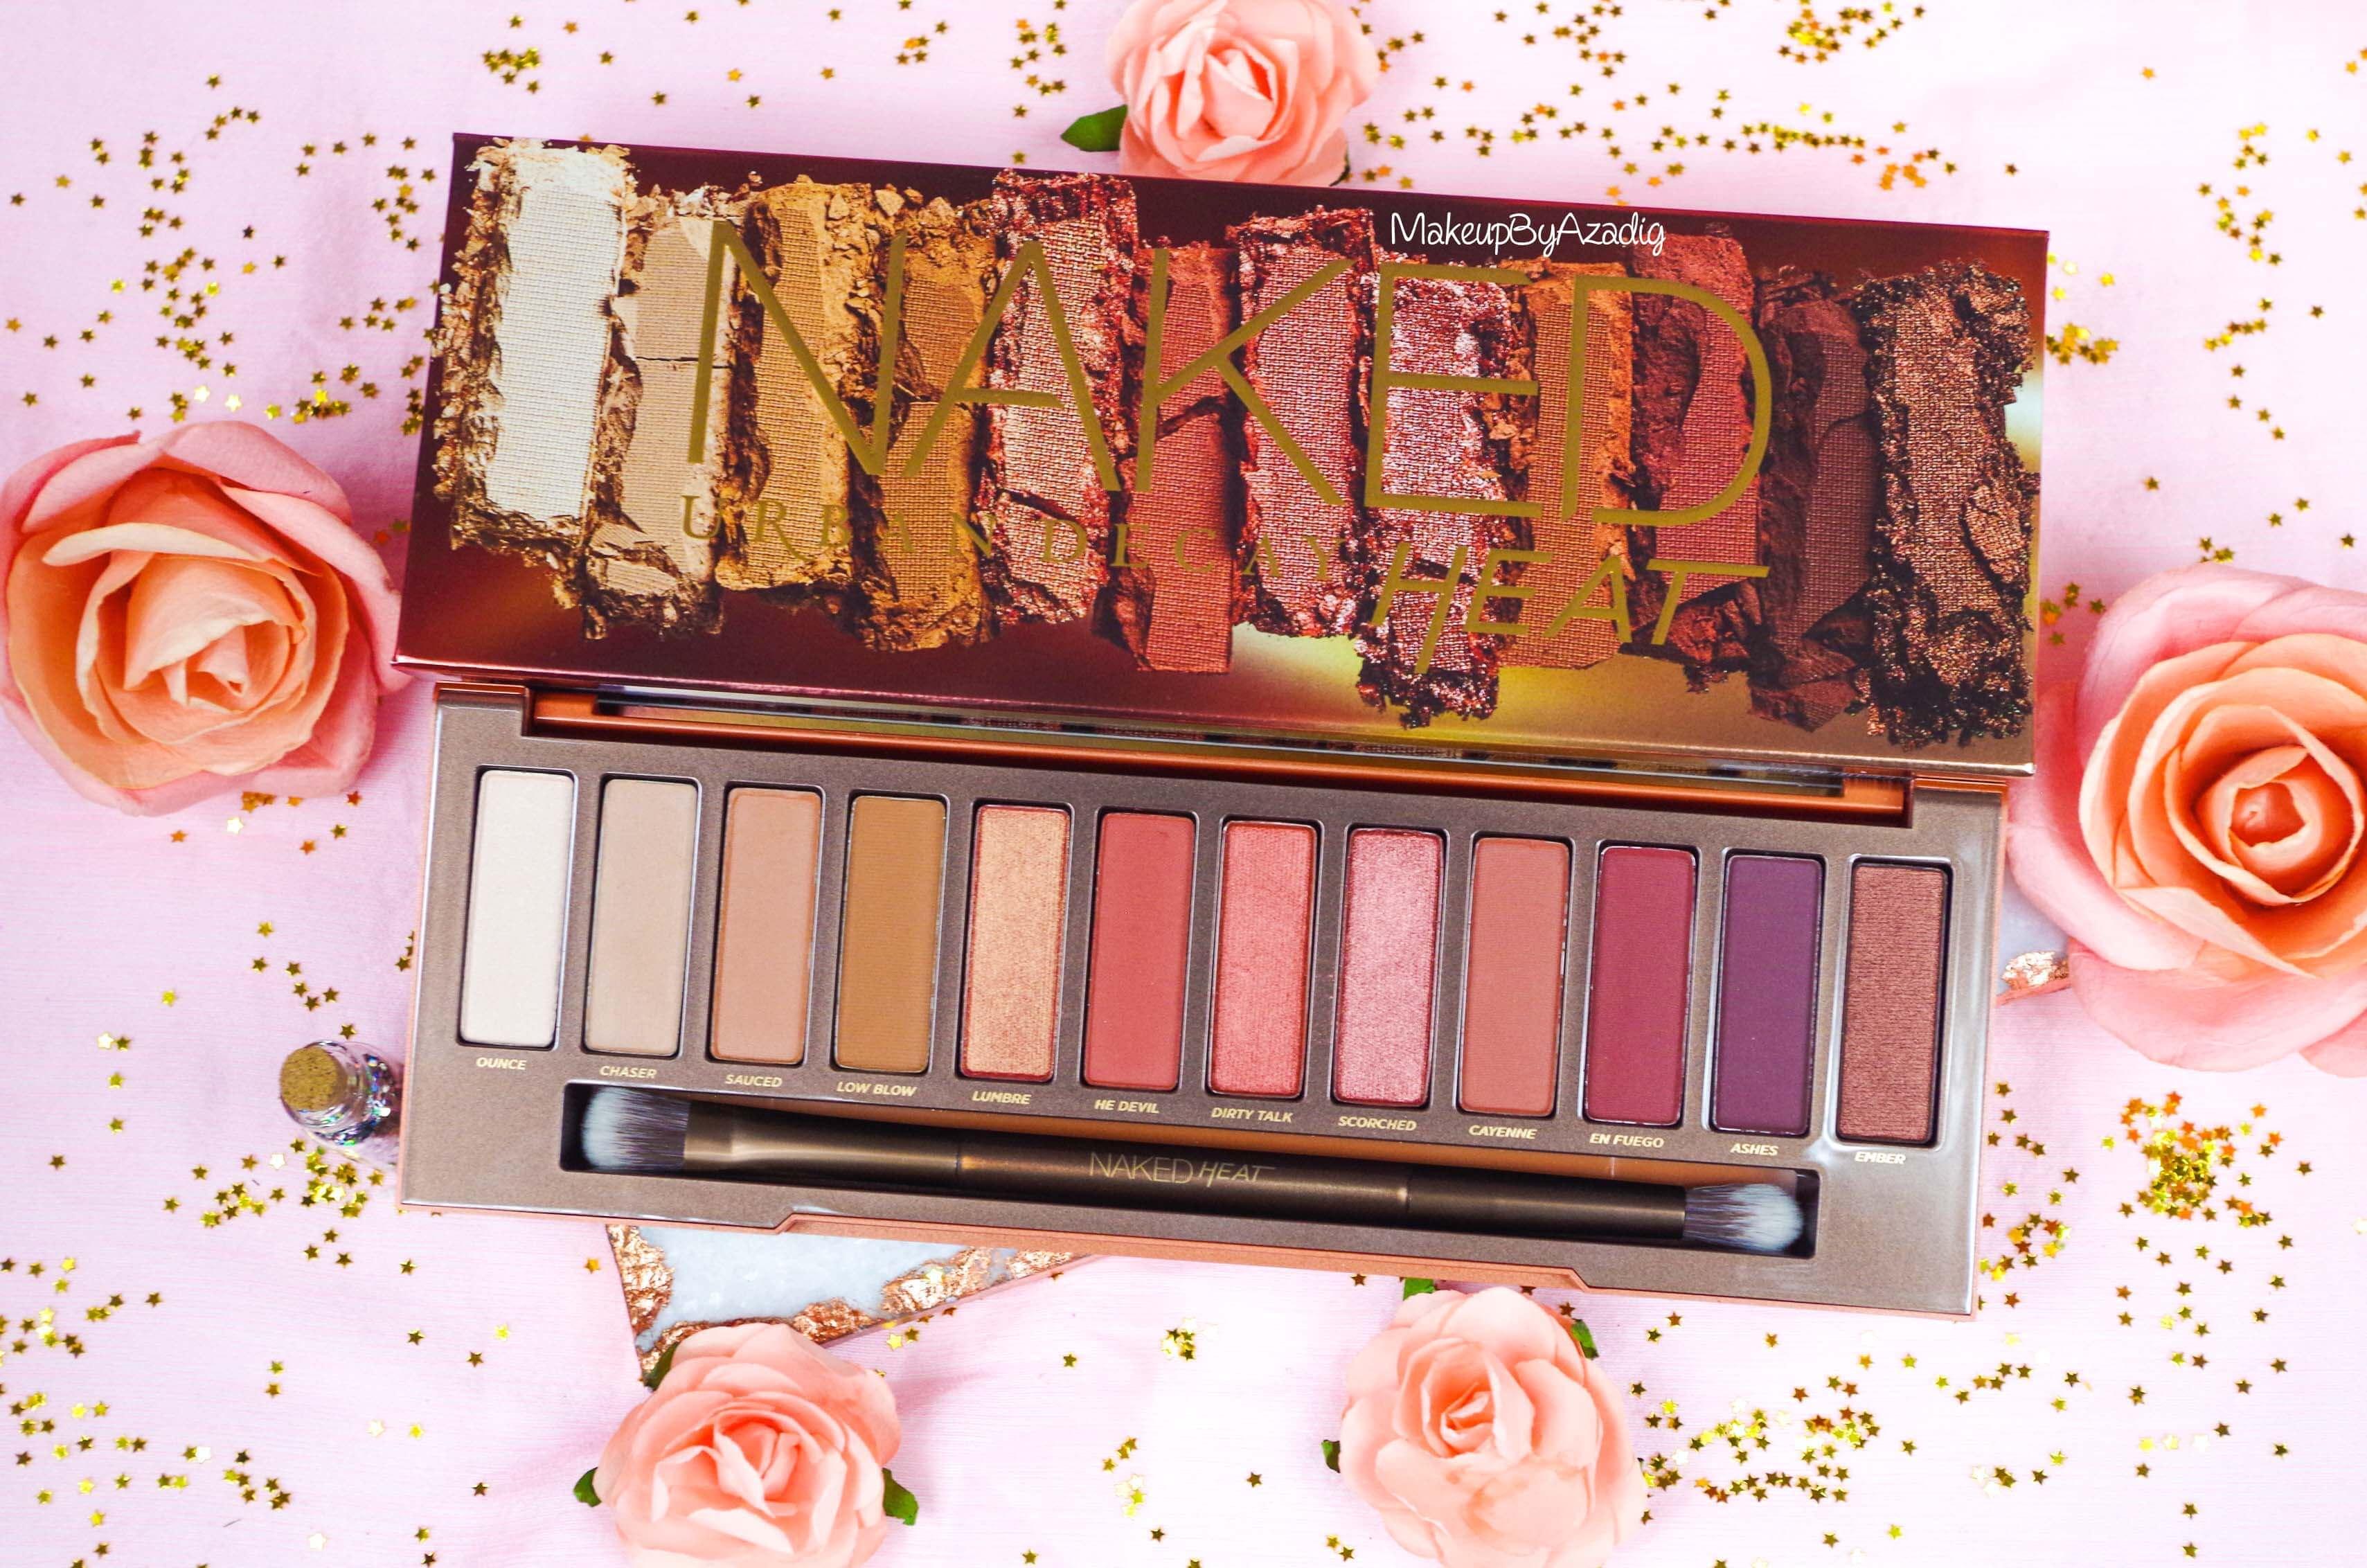 revue-review-nouvelle-palette-naked-heat-urban-decay-sephora-avis-prix-france-makeupbyazadig-swatch-eyeshadows